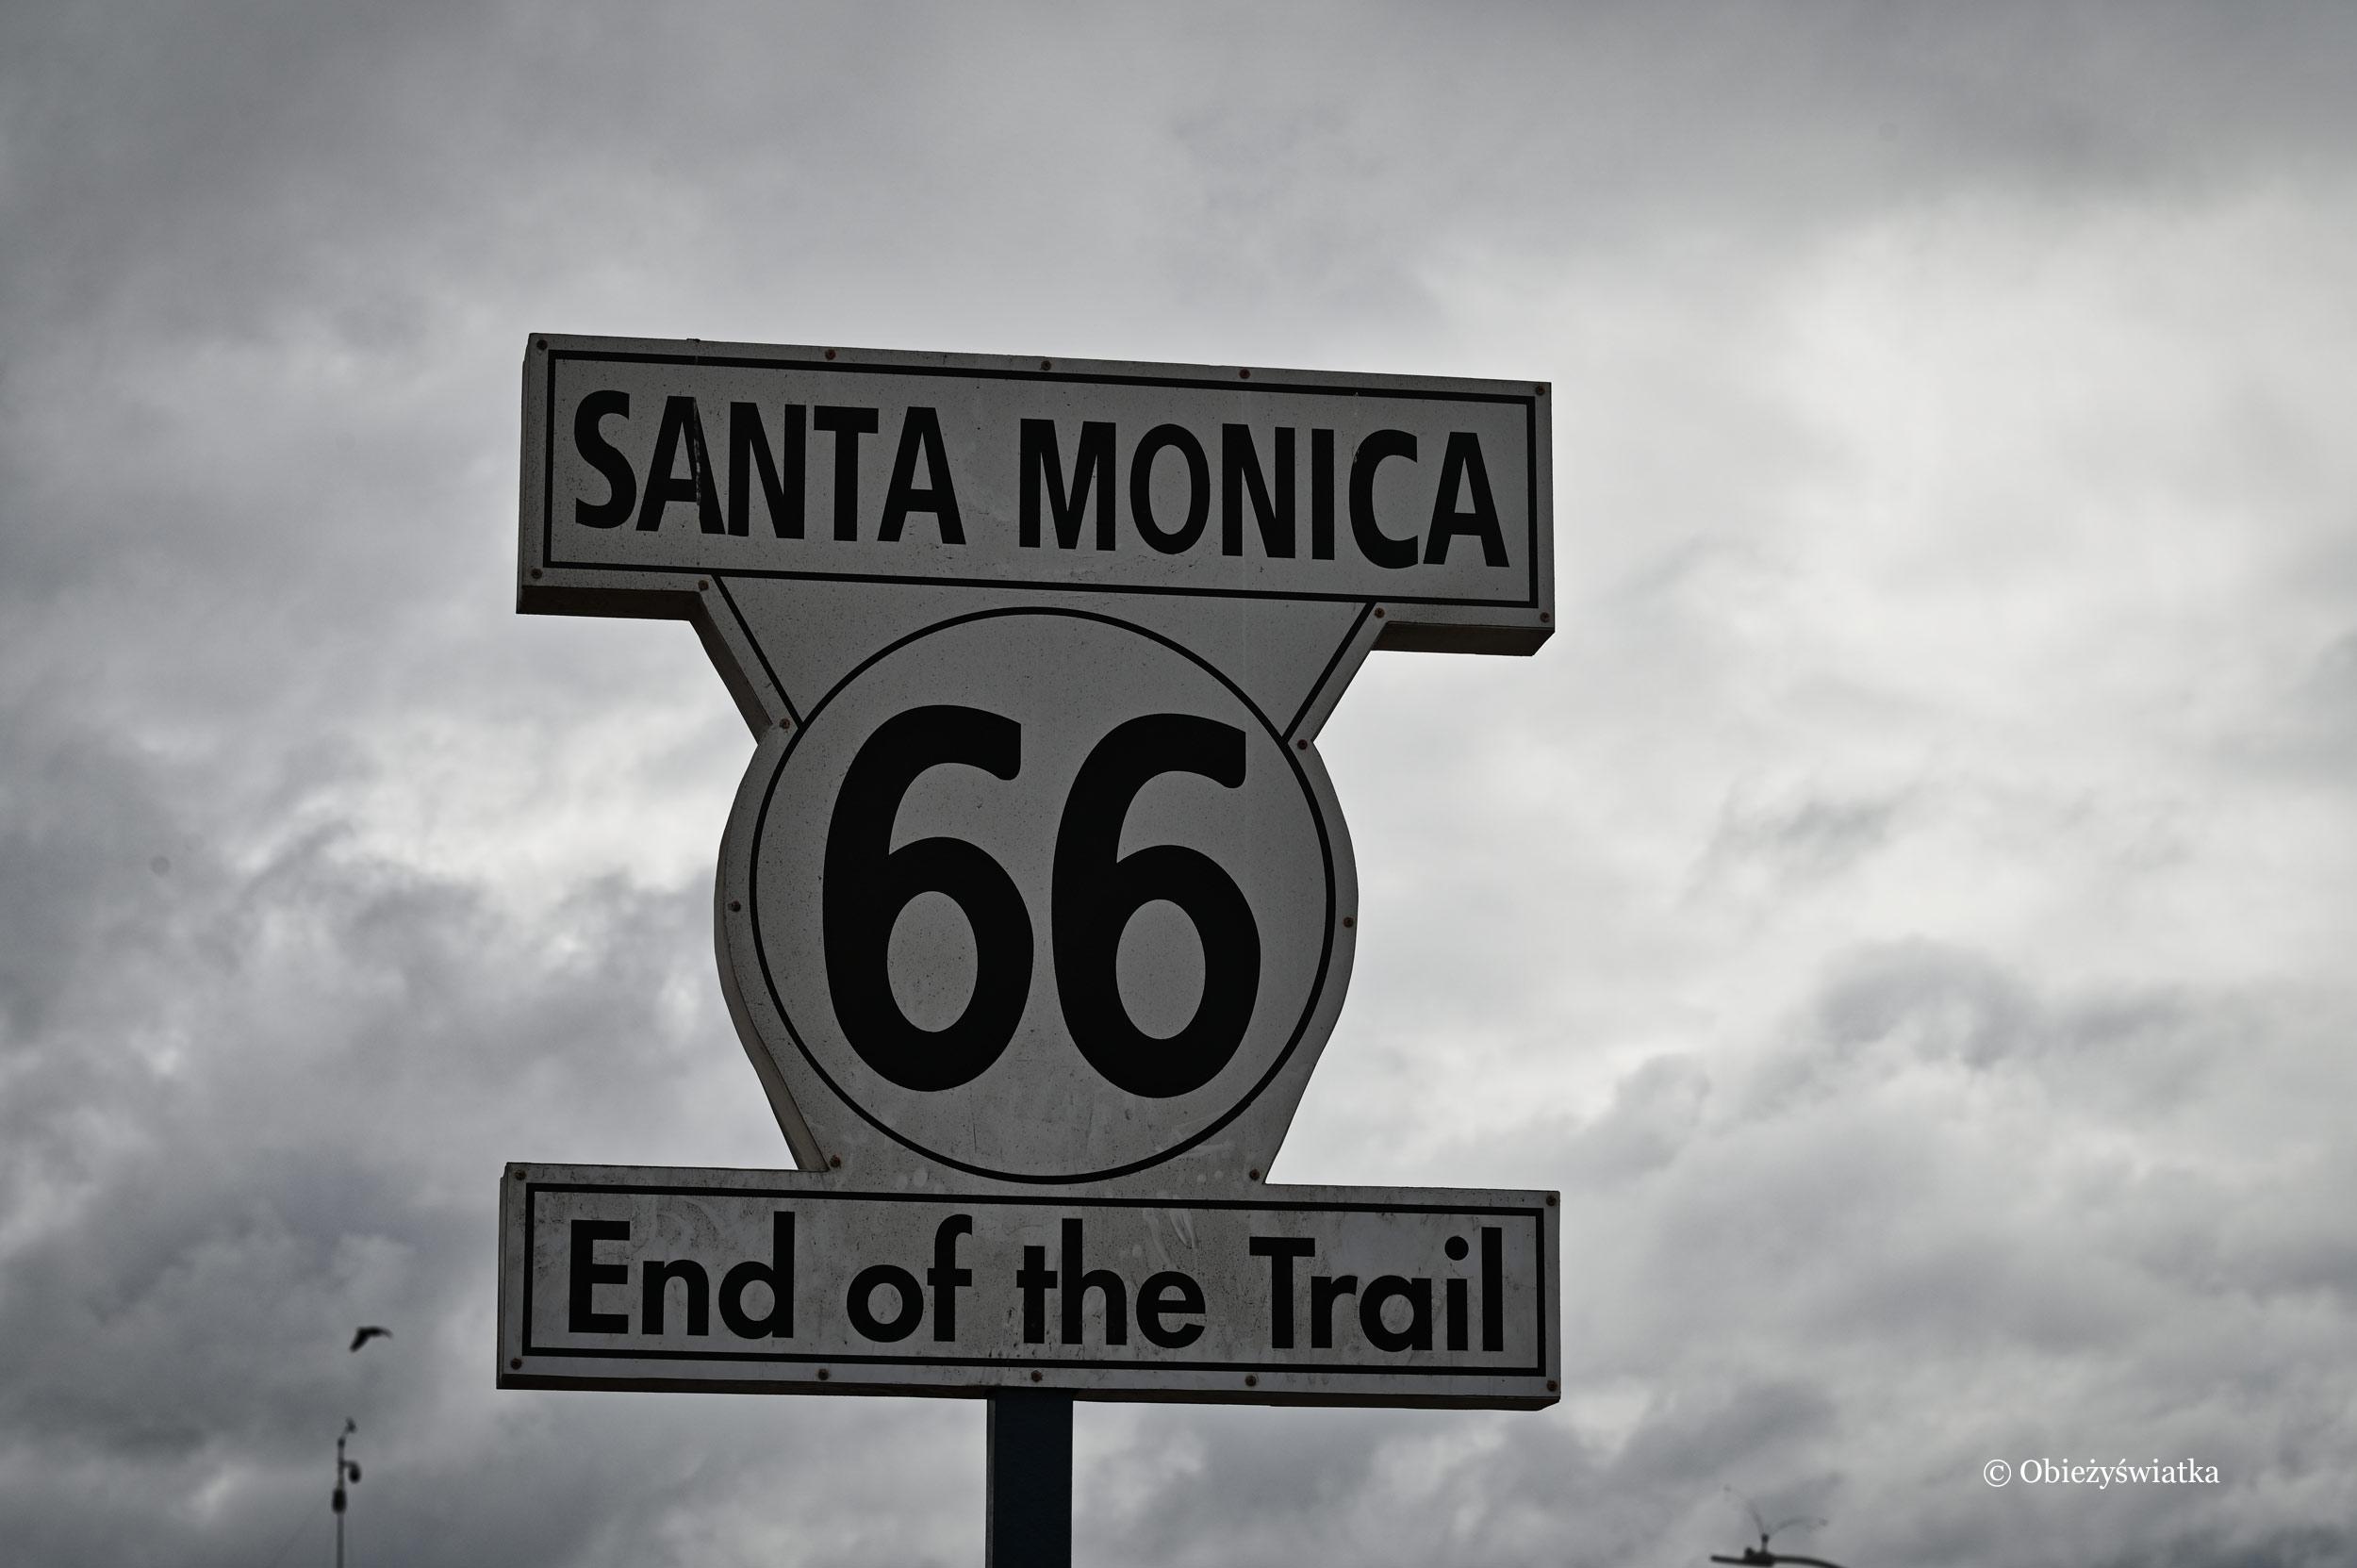 Santa Monica, koniec legendarnej trasy 66